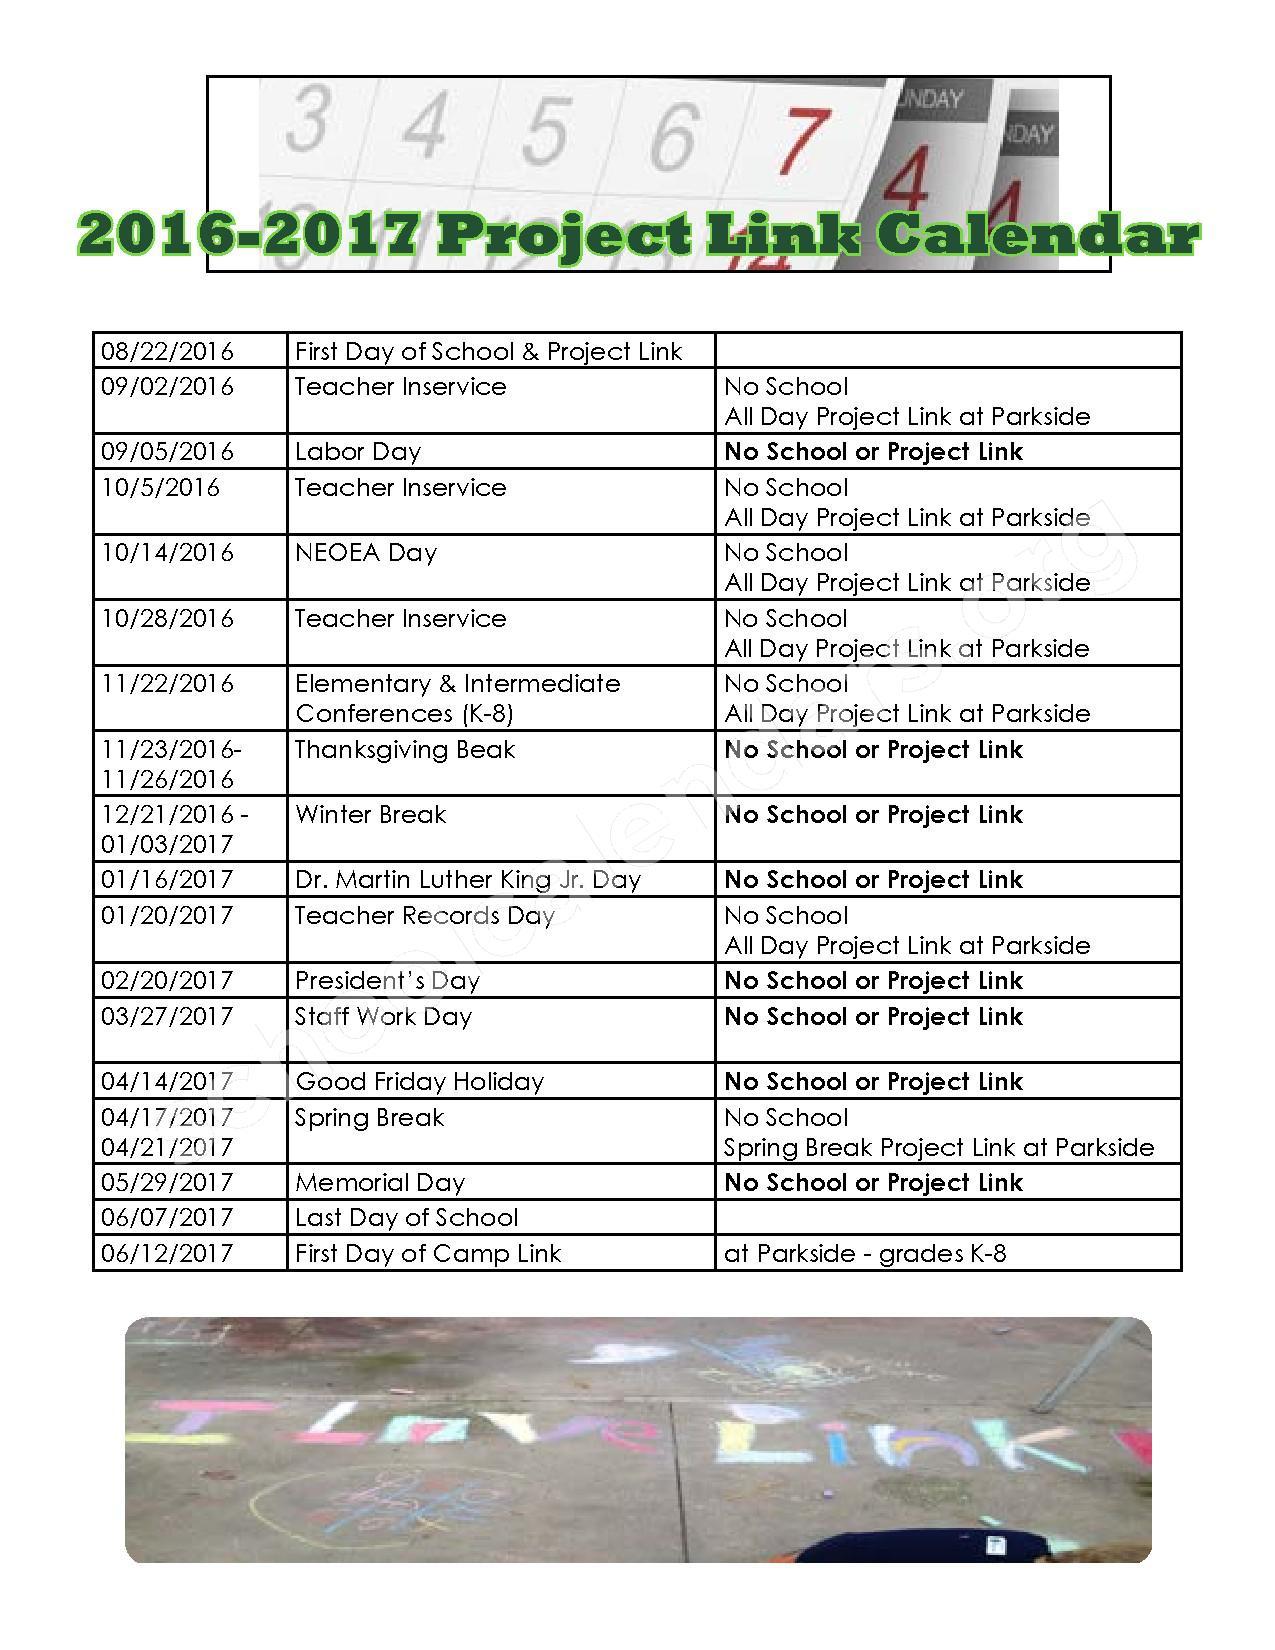 2016 - 2017 School Calendar – Holly Lane Elementary School – page 1